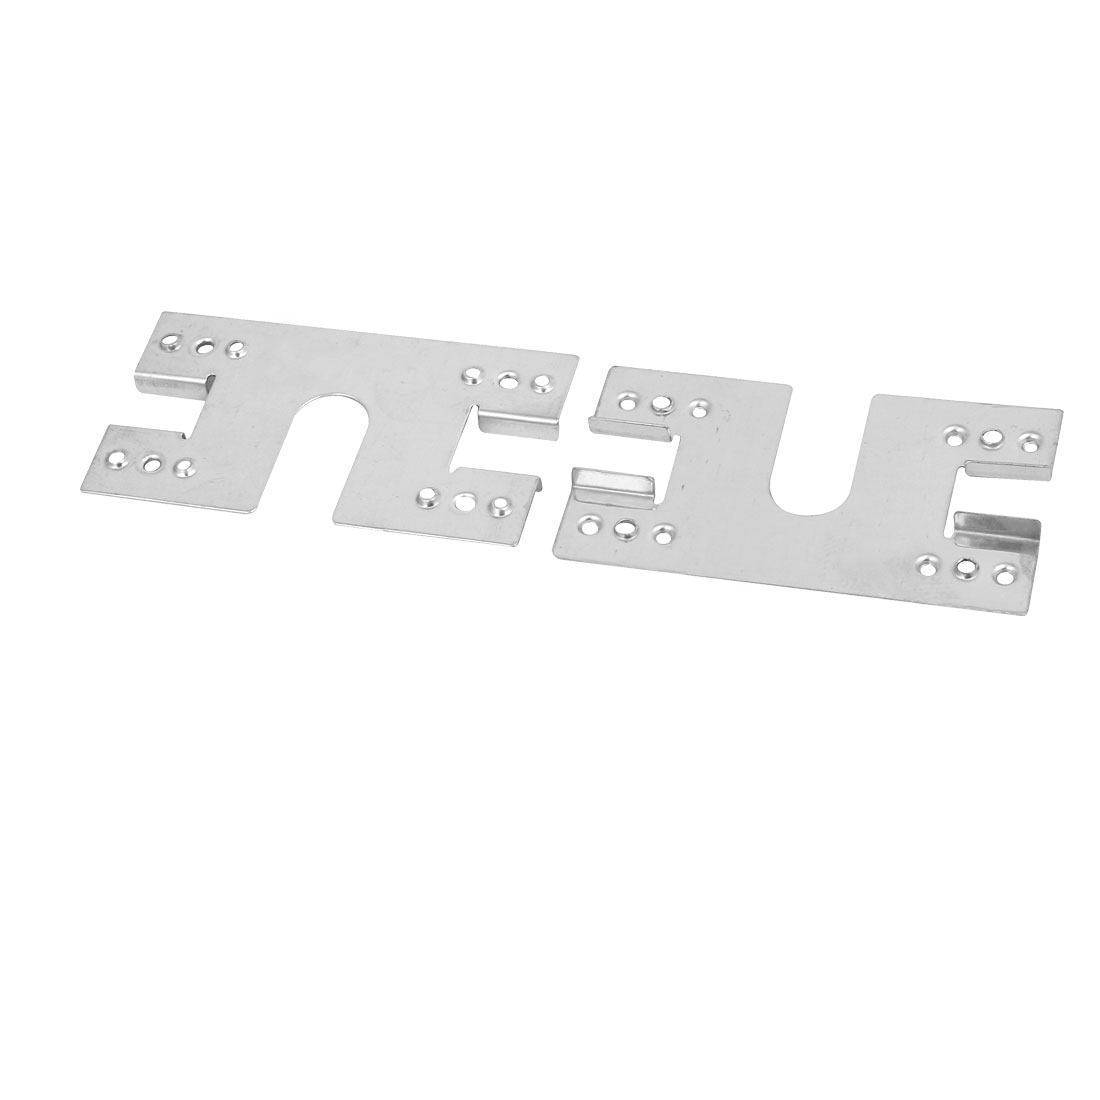 Unique Bargains 50pcs 50x28x3mm Stainless Steel Solar Conducting Strip Roof Mounting Bracket - image 1 de 2